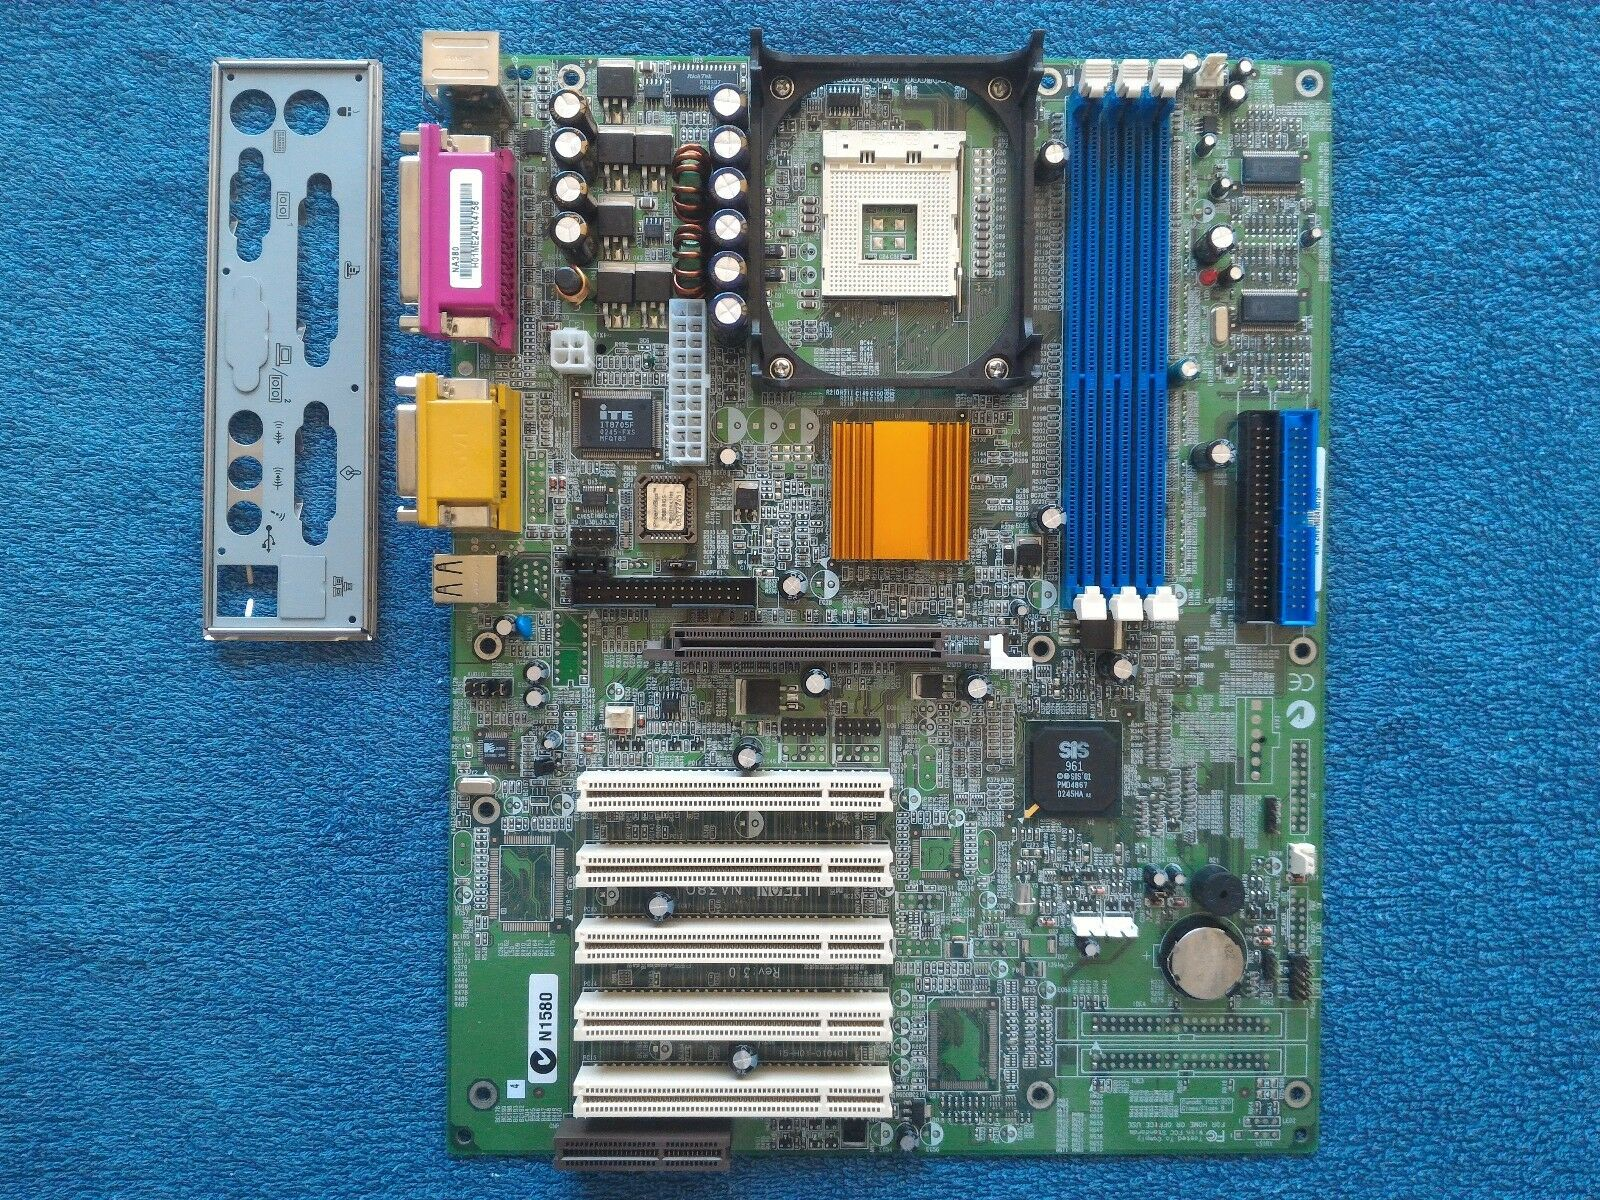 SiS 645 chipset